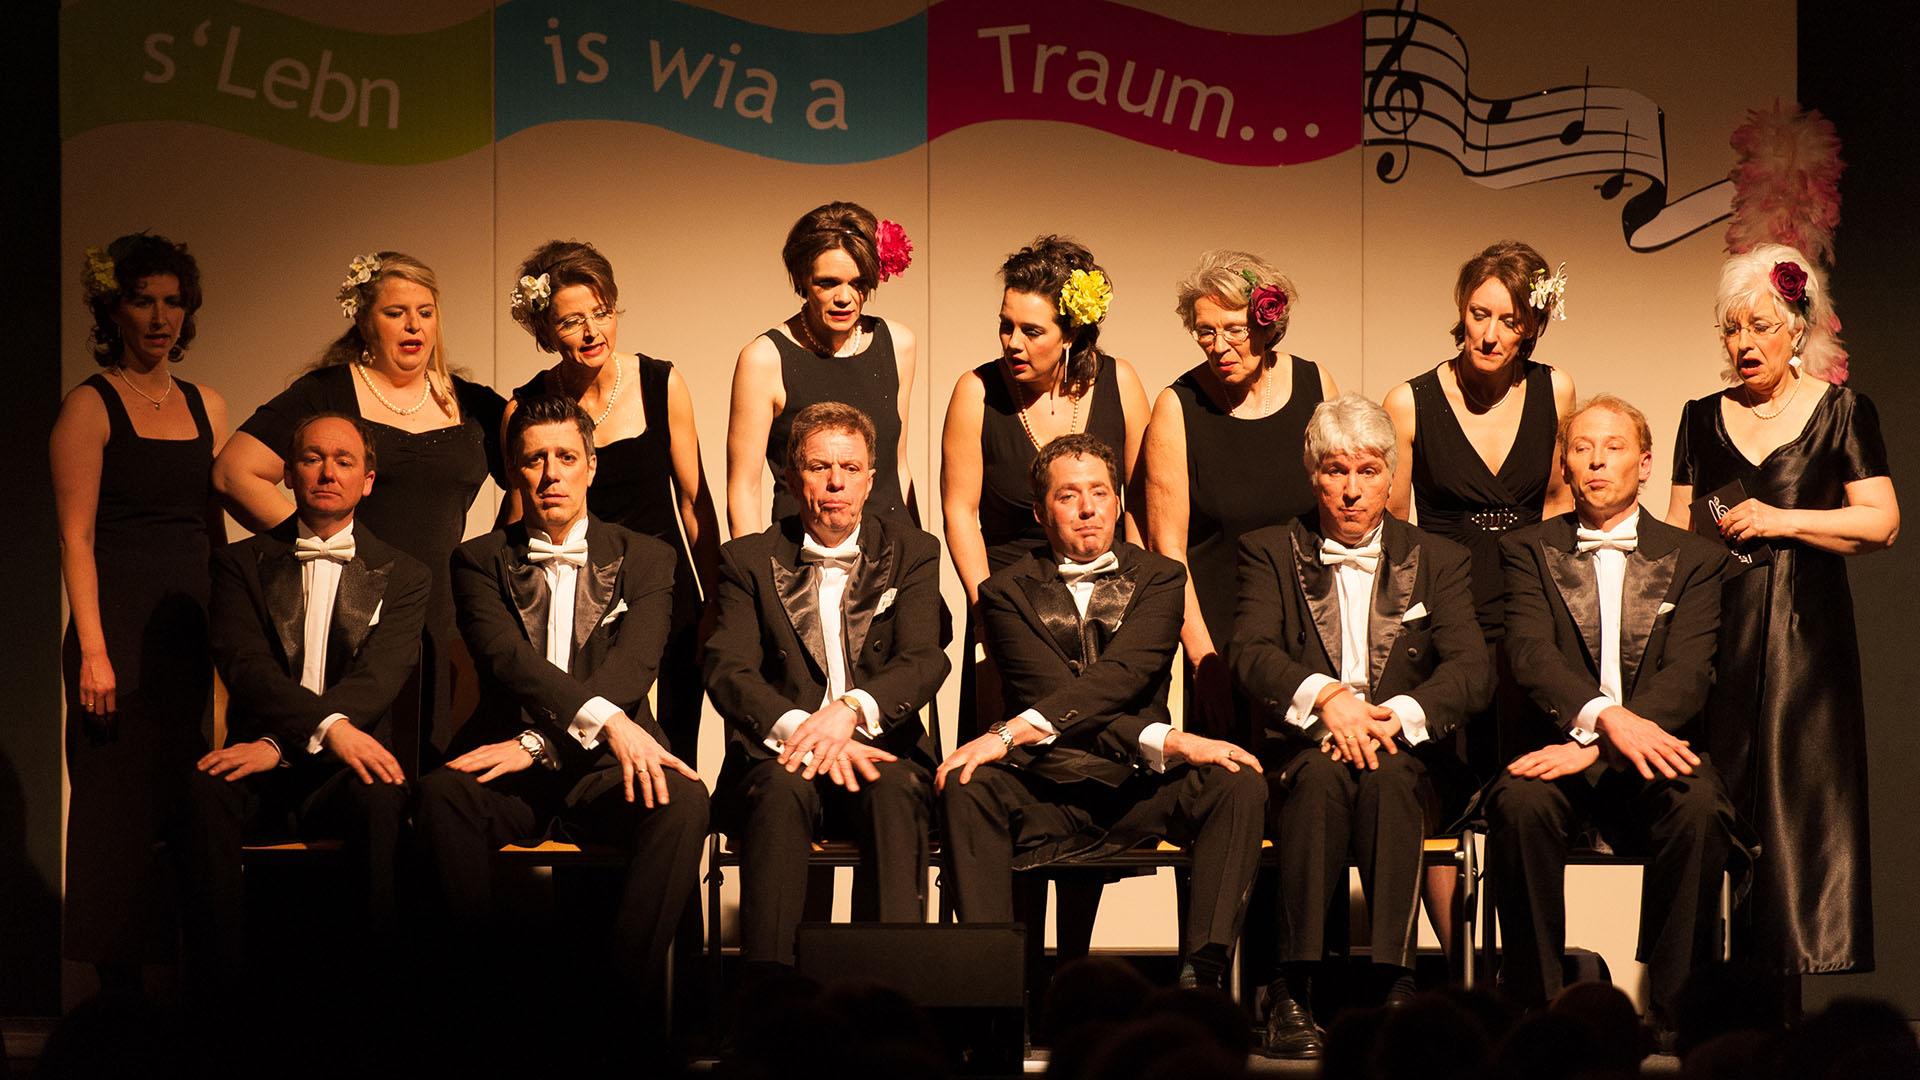 Konzertfotografie Konzert vom A-Capella Chor Rimsingers im Schloss Amerang